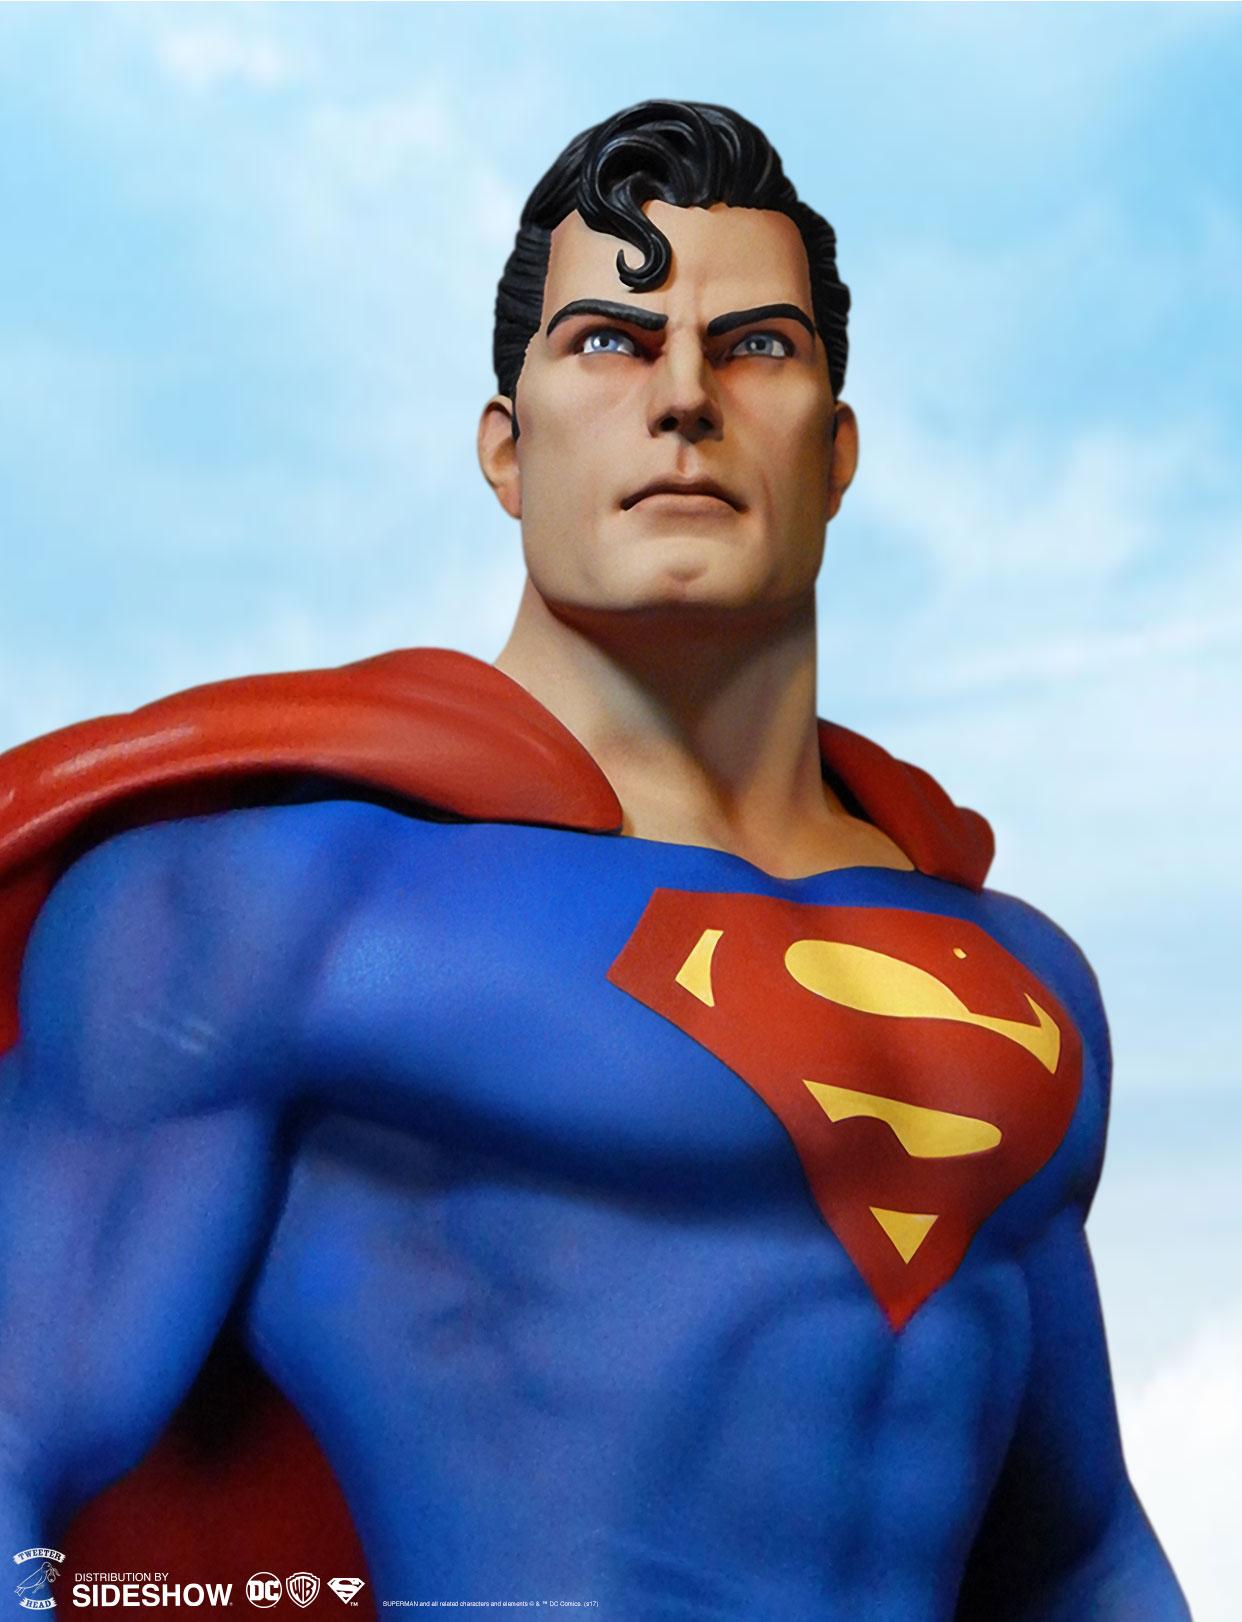 29e3a80234332 DC Comics Super Powers Superman Maquette by Tweeterhead | Sideshow ...